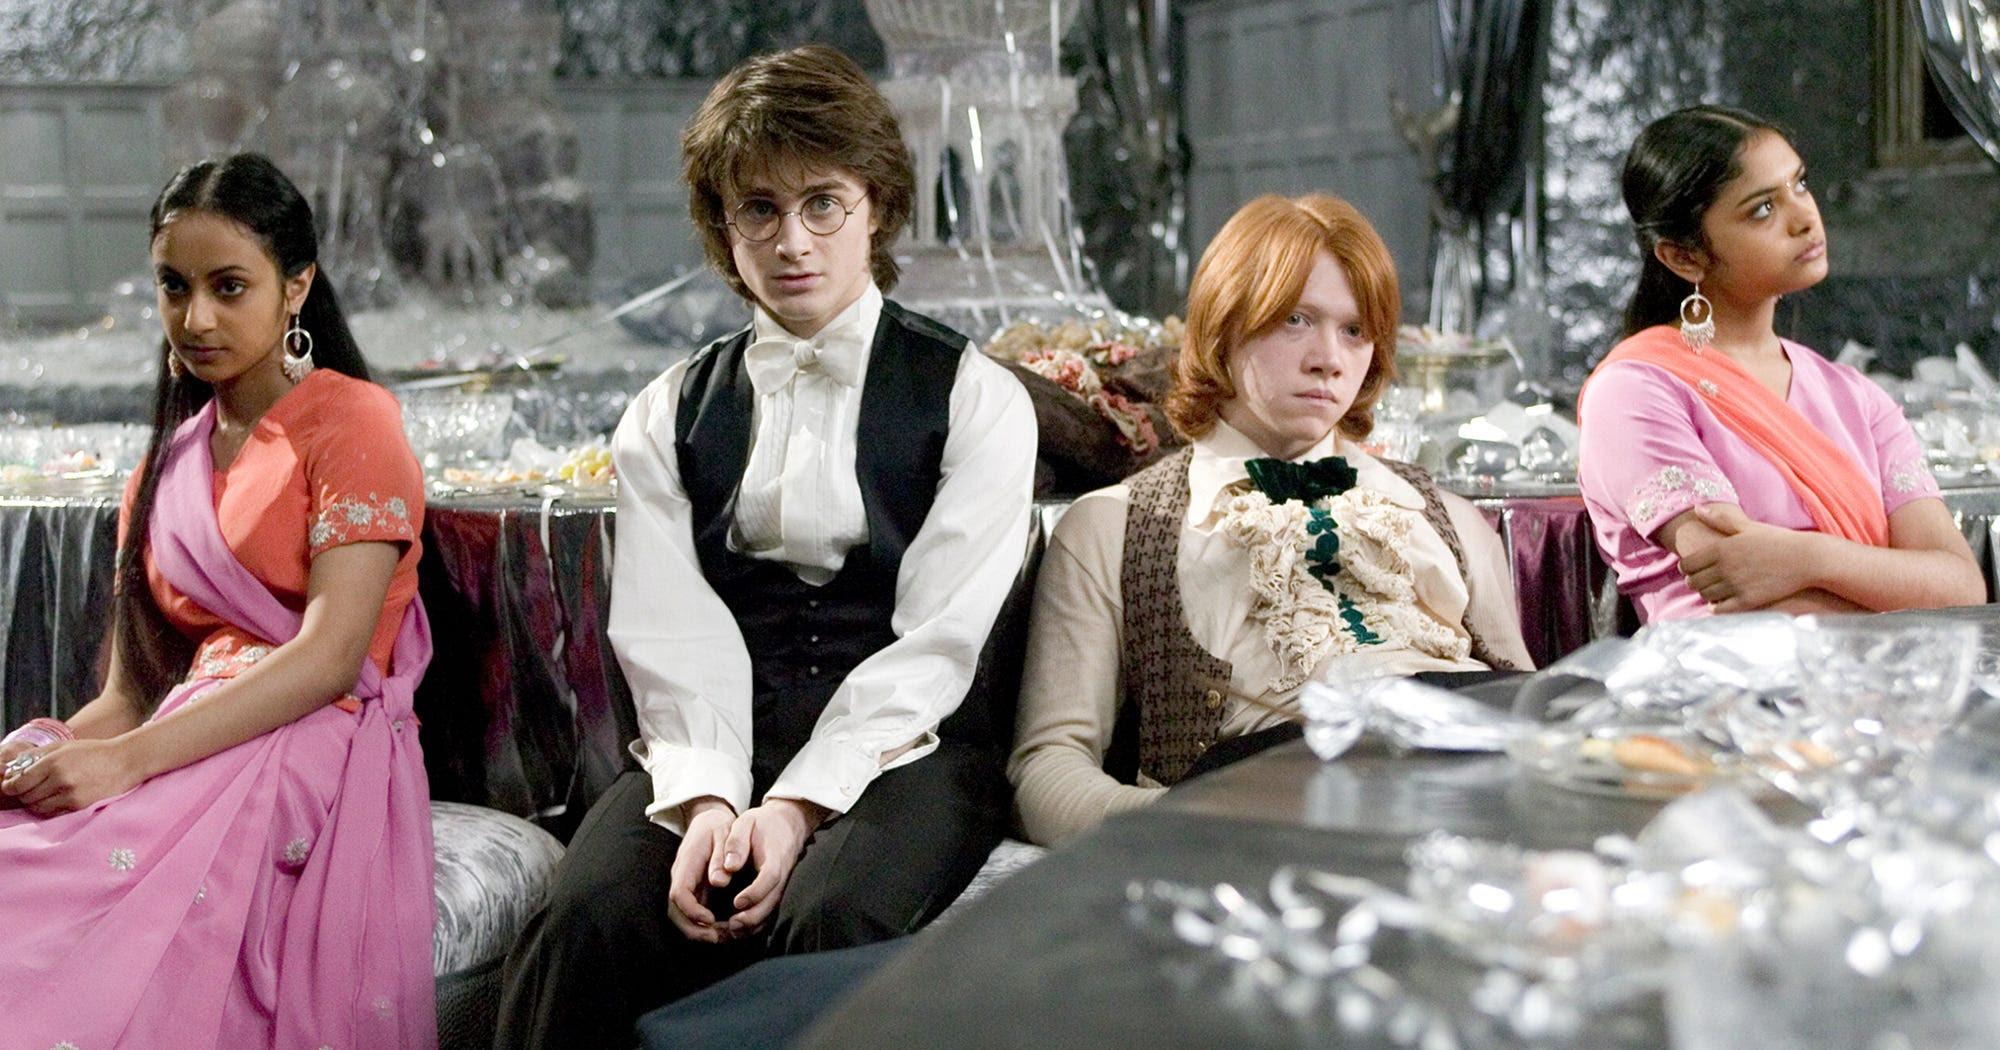 via0.com - Harry Potter Valentine's Day Dinner Hogwarts London